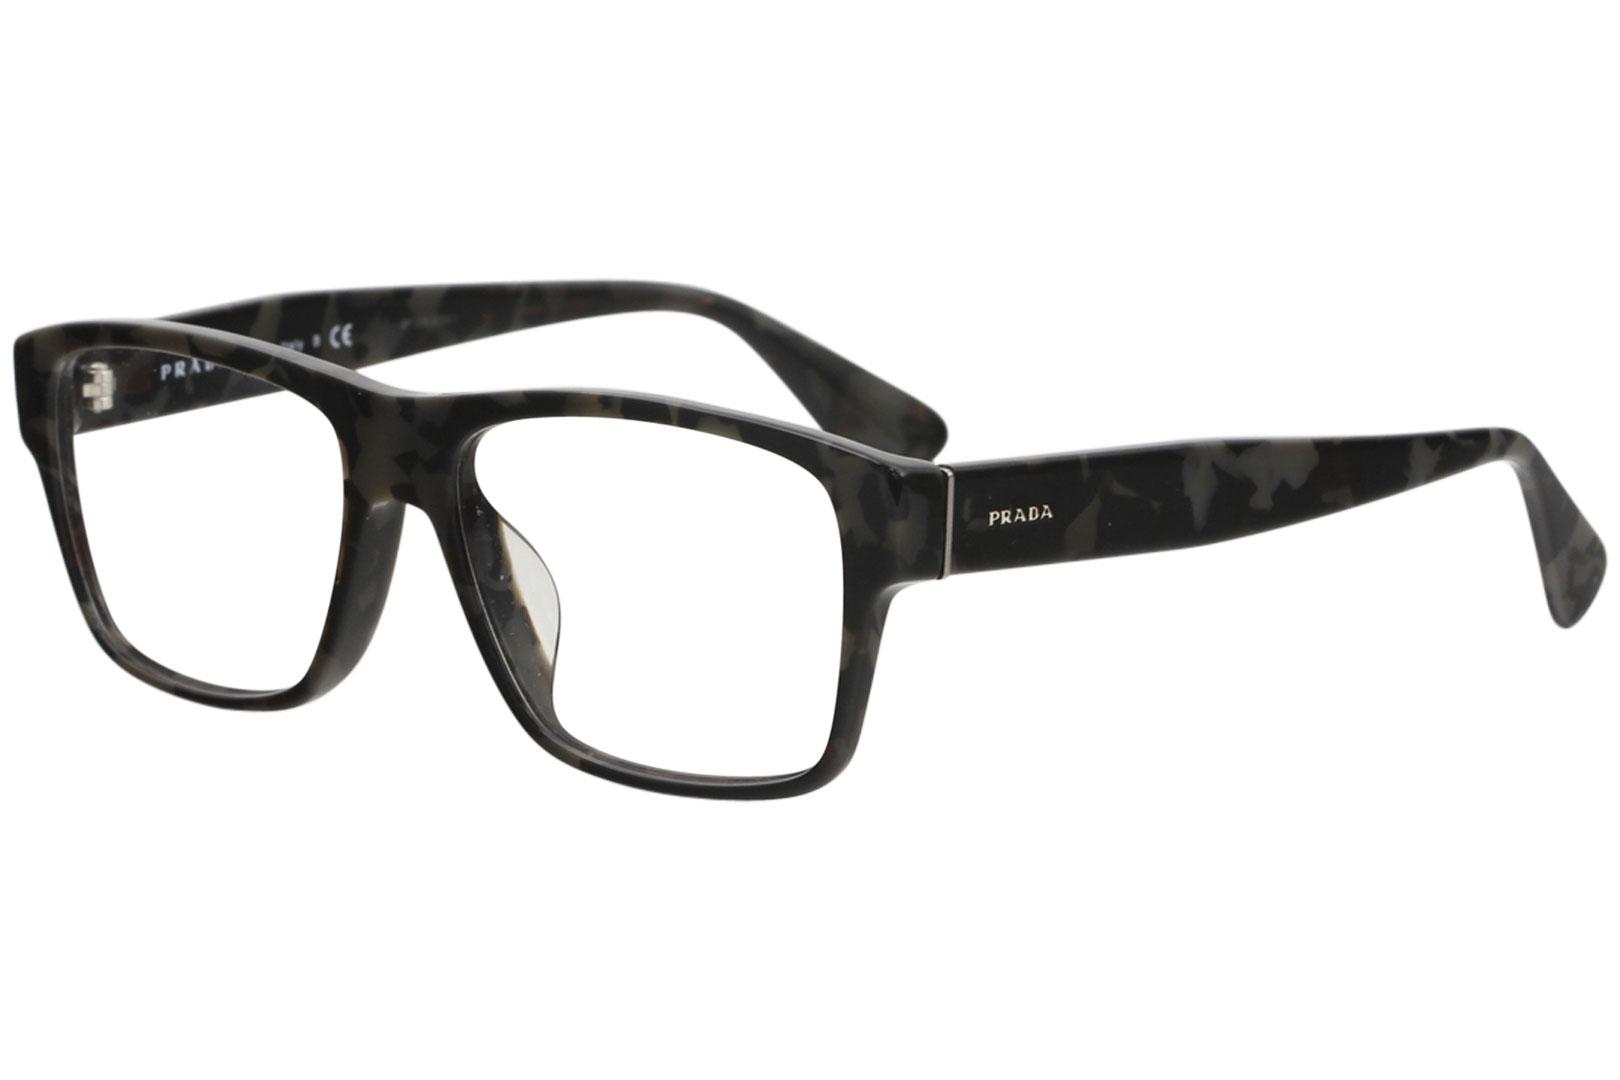 aba3eb08ce32 Details about Prada Eyeglasses VPR17SF VPR 17SF UEL 1O1 Spotted Brown Grey Optical  Frame 55mm